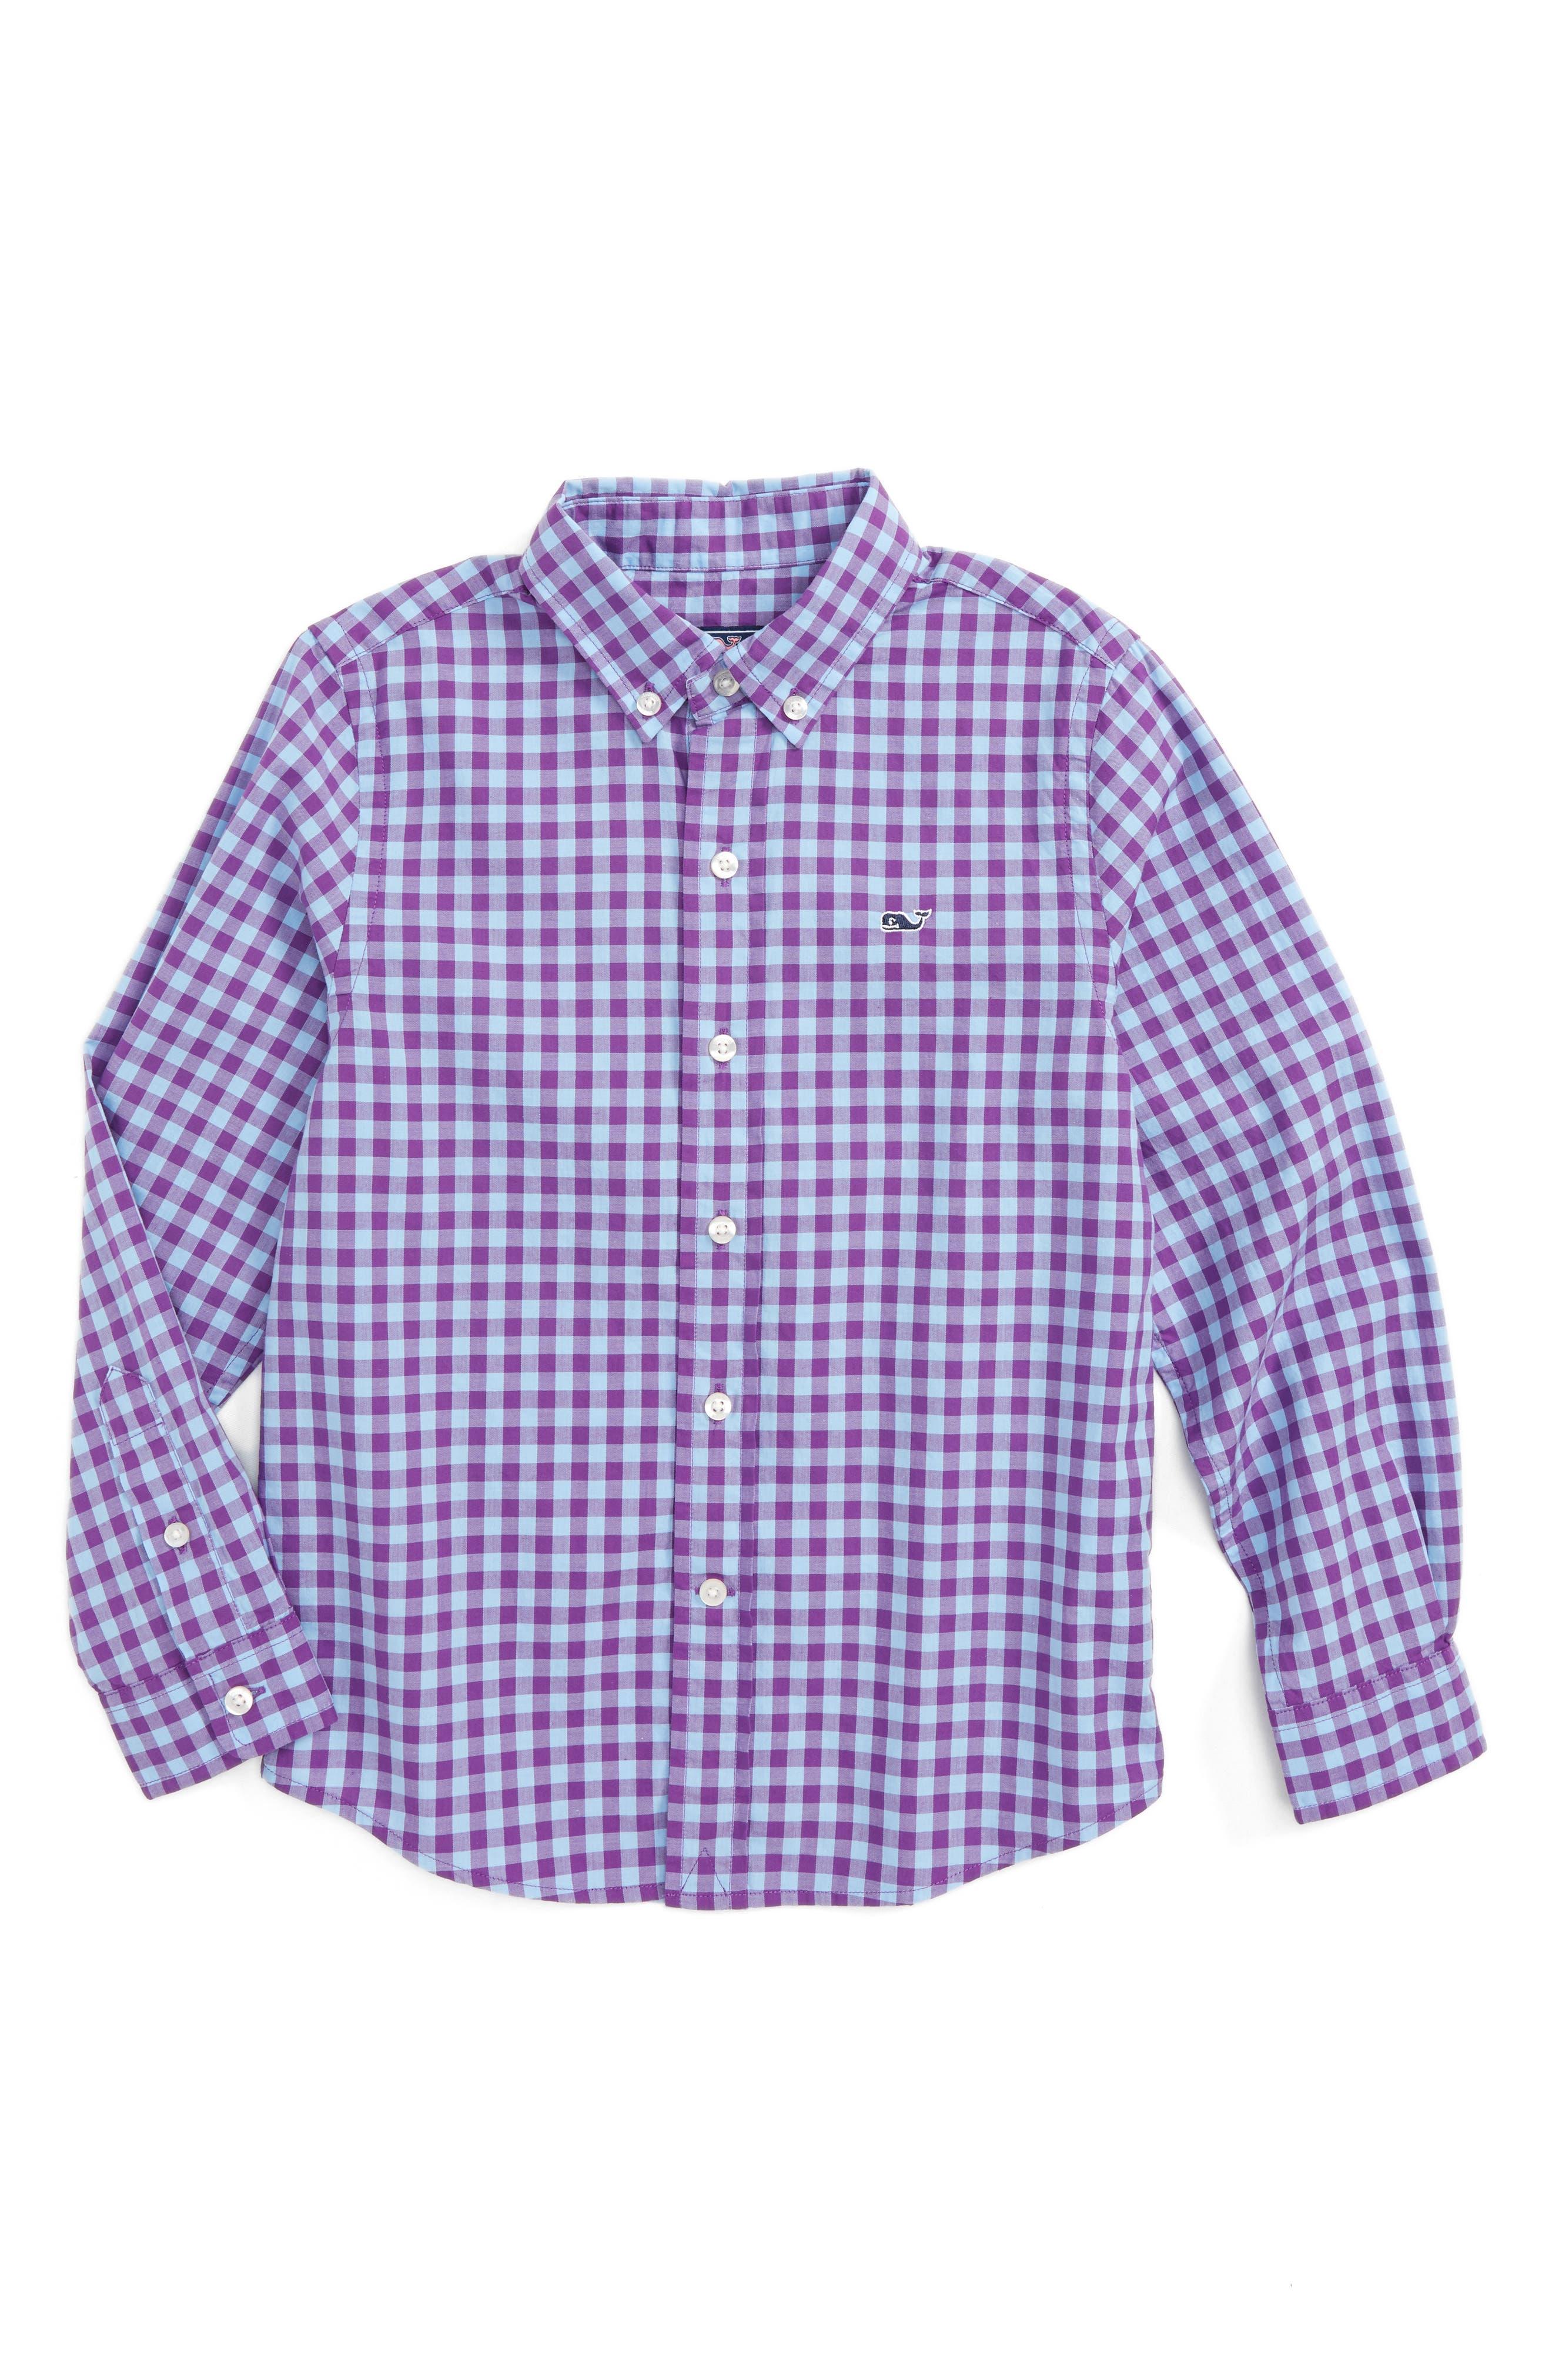 Foggy Quarter Gingham Whale Shirt,                             Main thumbnail 1, color,                             517